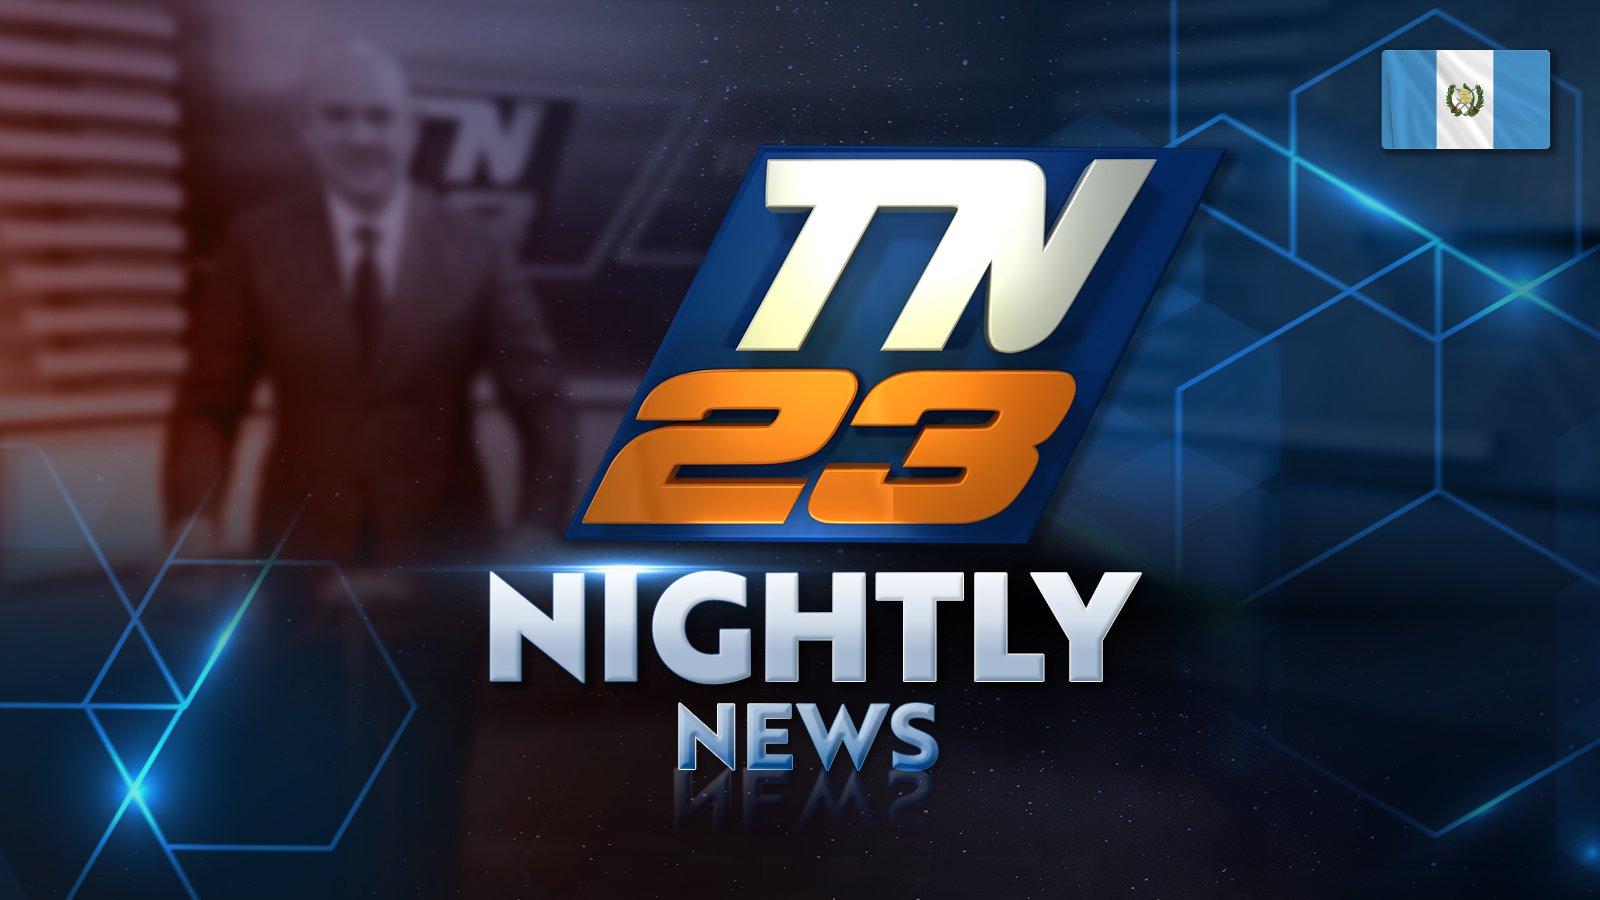 Nightly TN23 News poster